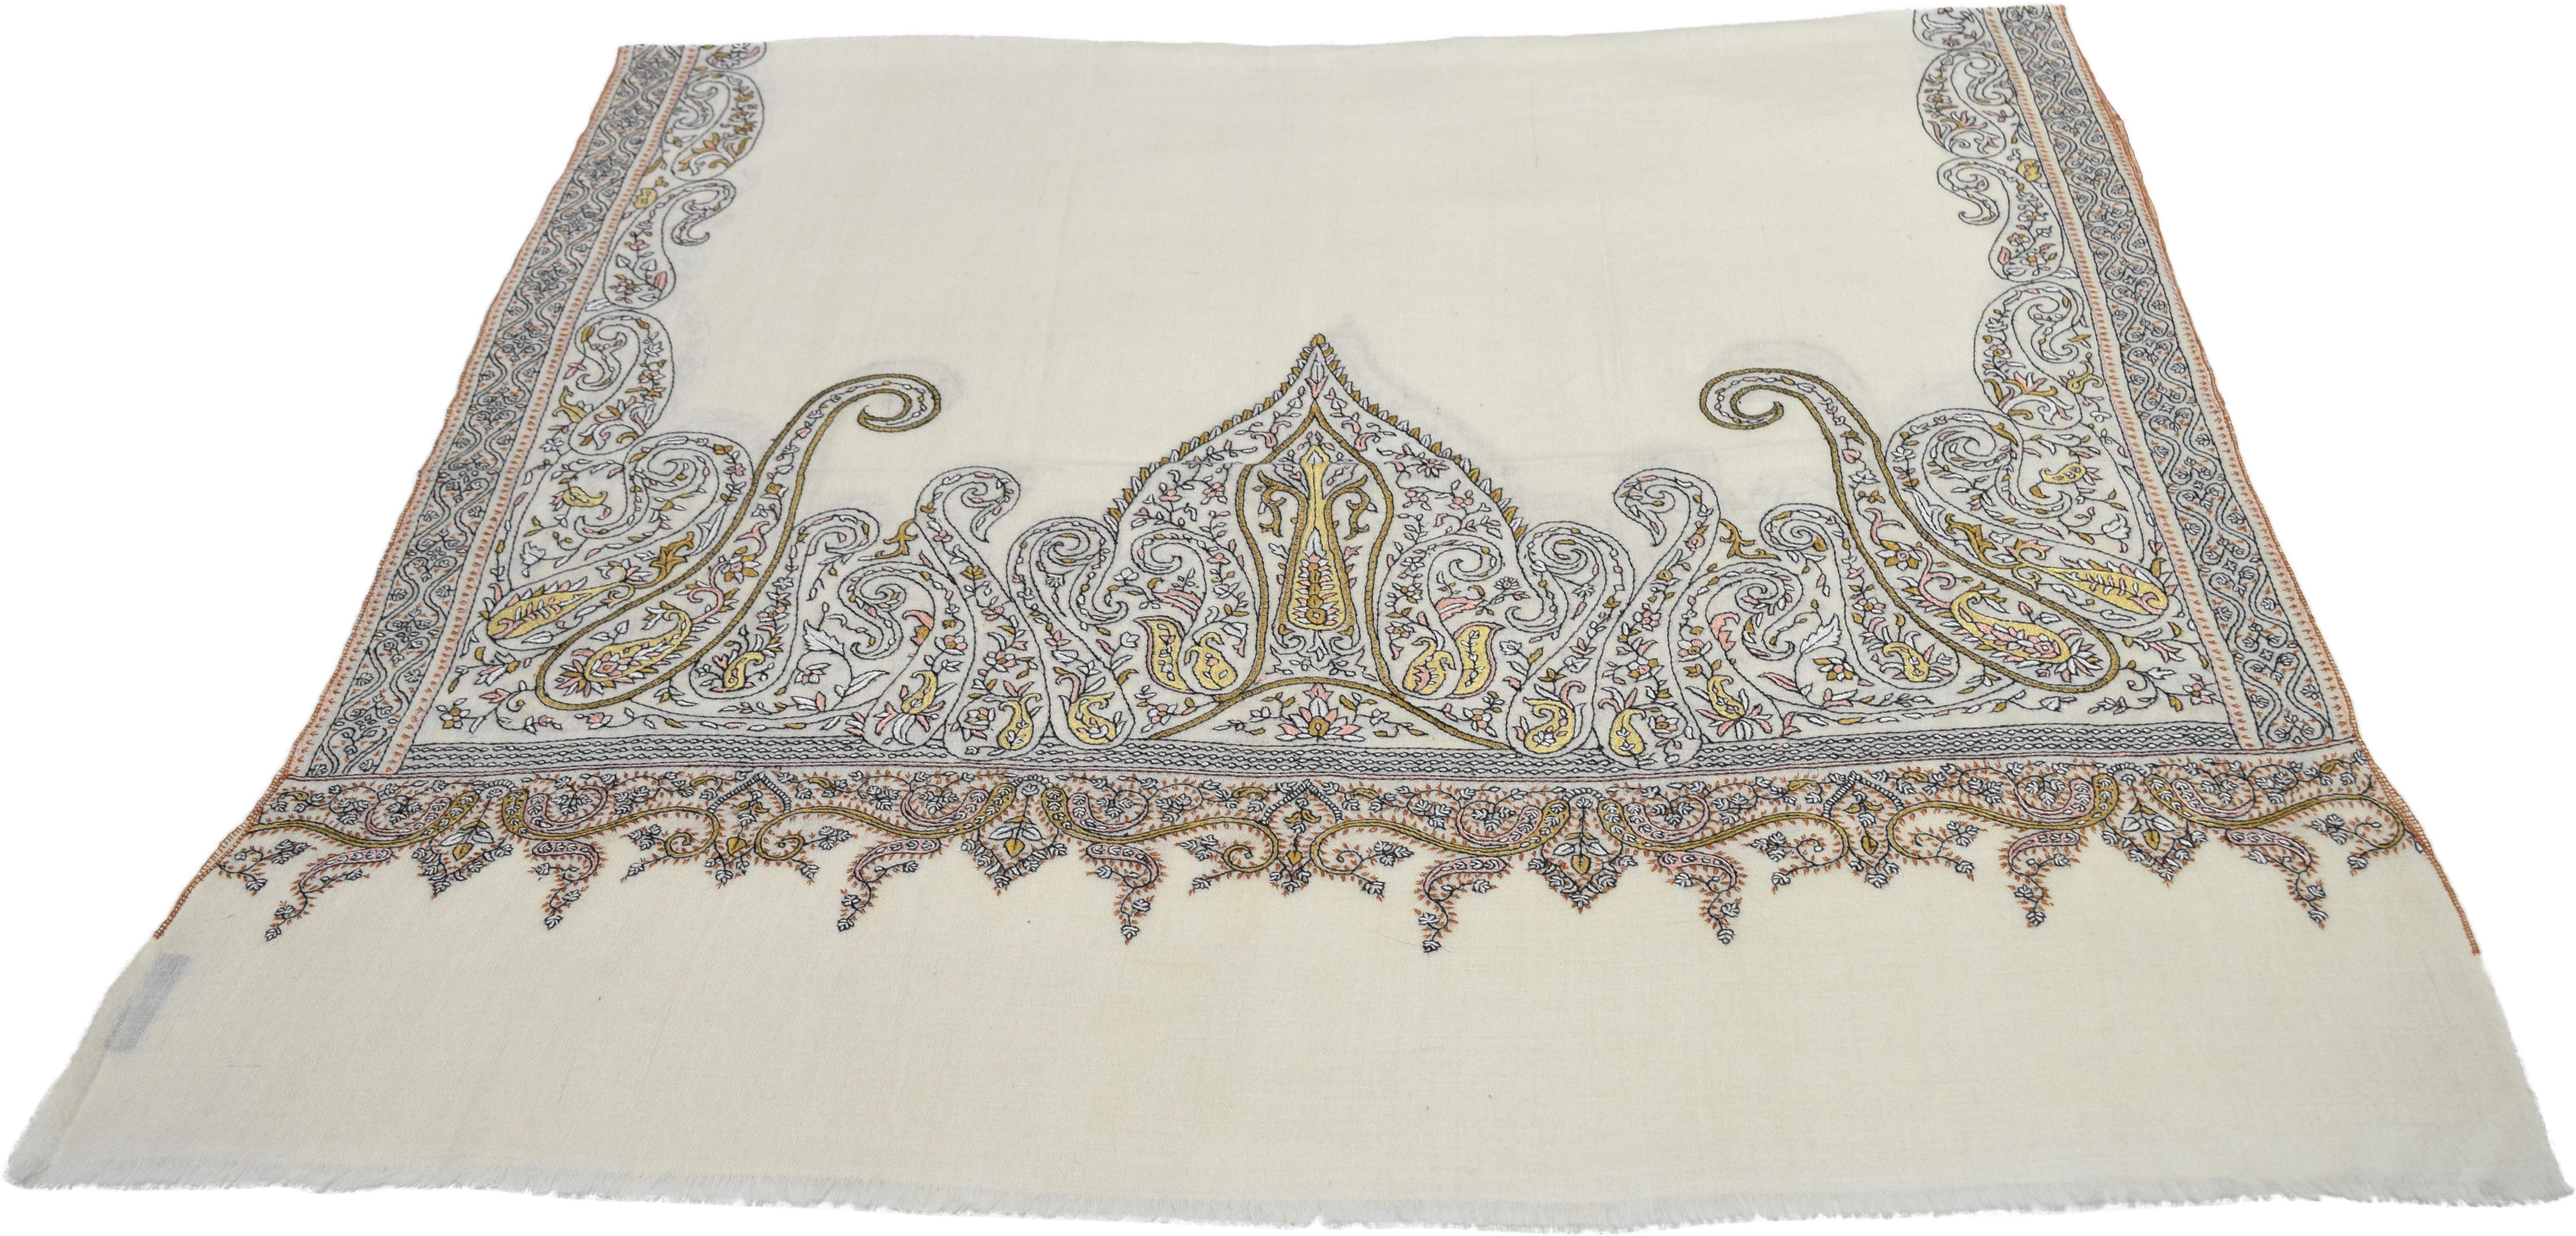 Sofias Pashmina Embroidered Womens Shawl